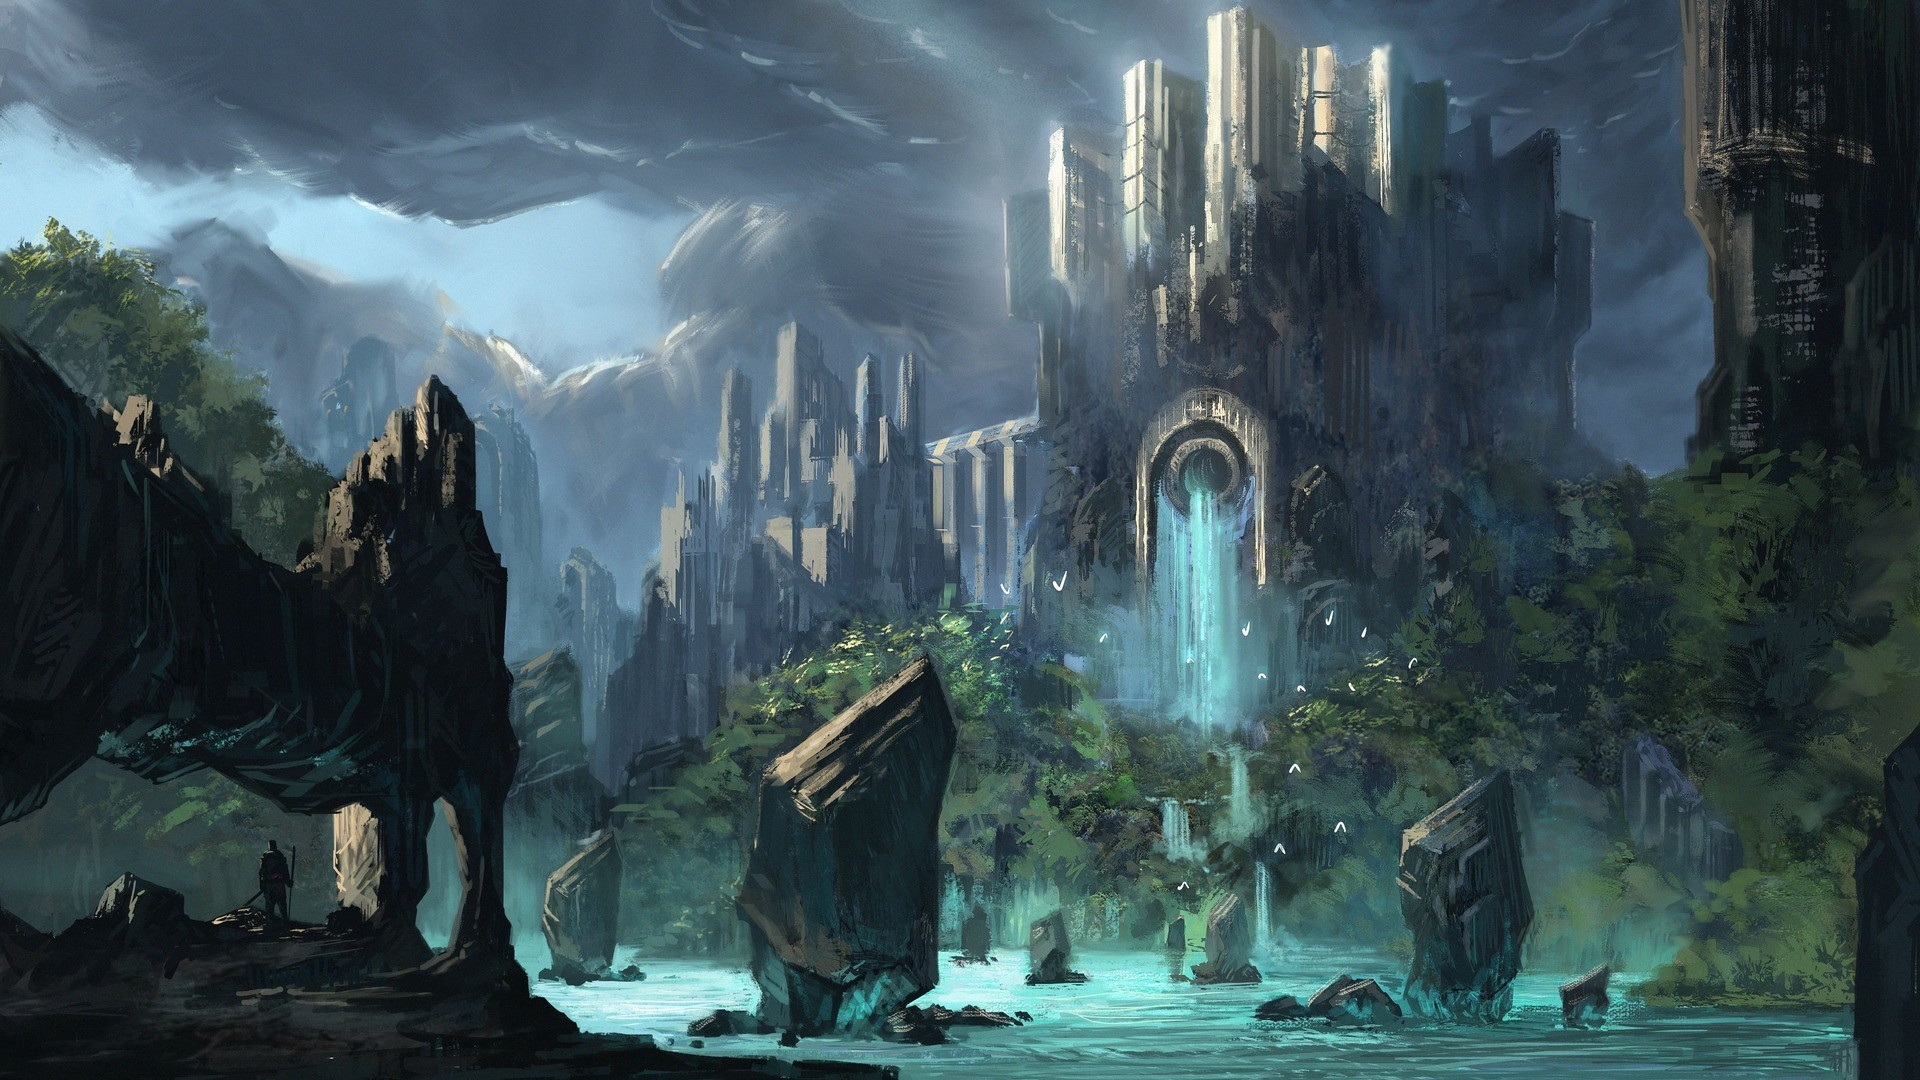 Dark Fantasy Background Wallpaper Hd With High-resolution - Fantasy Background - HD Wallpaper